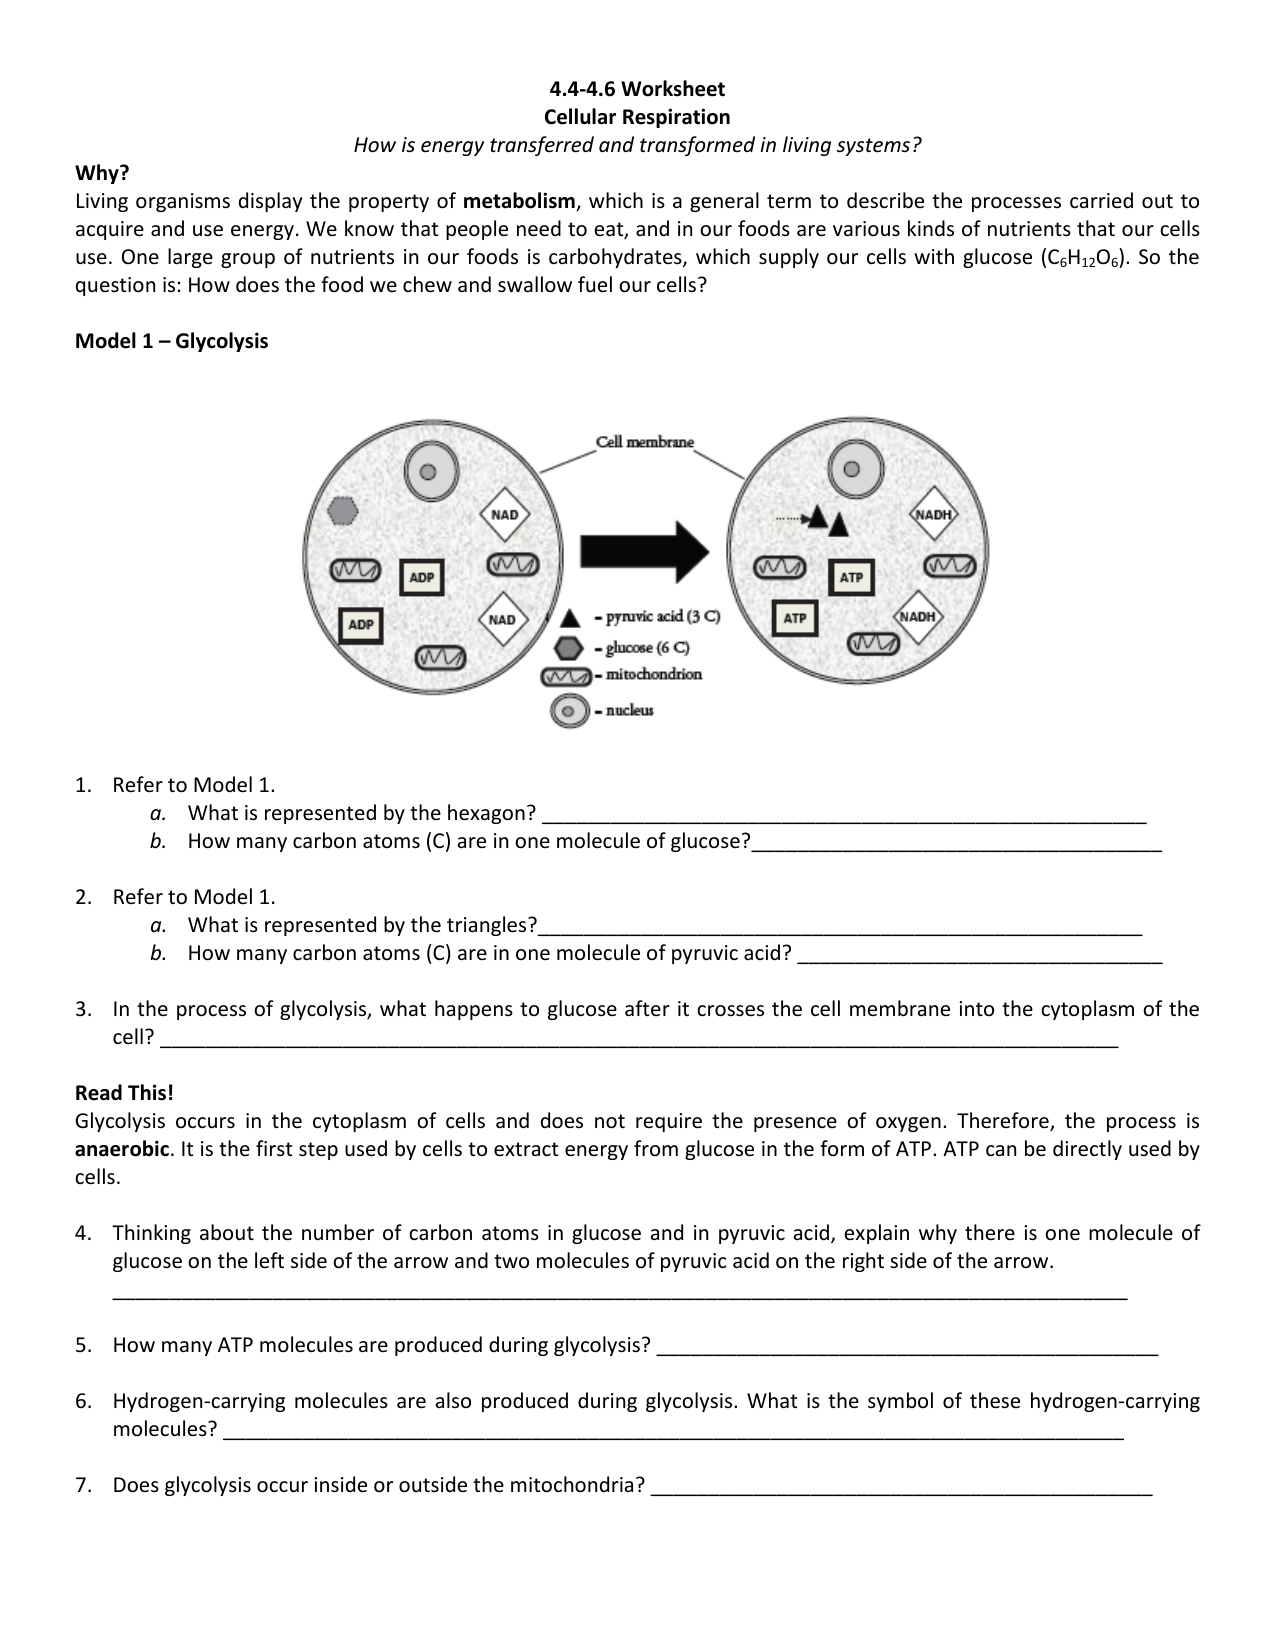 Cellular Respiration Worksheet Key  970172